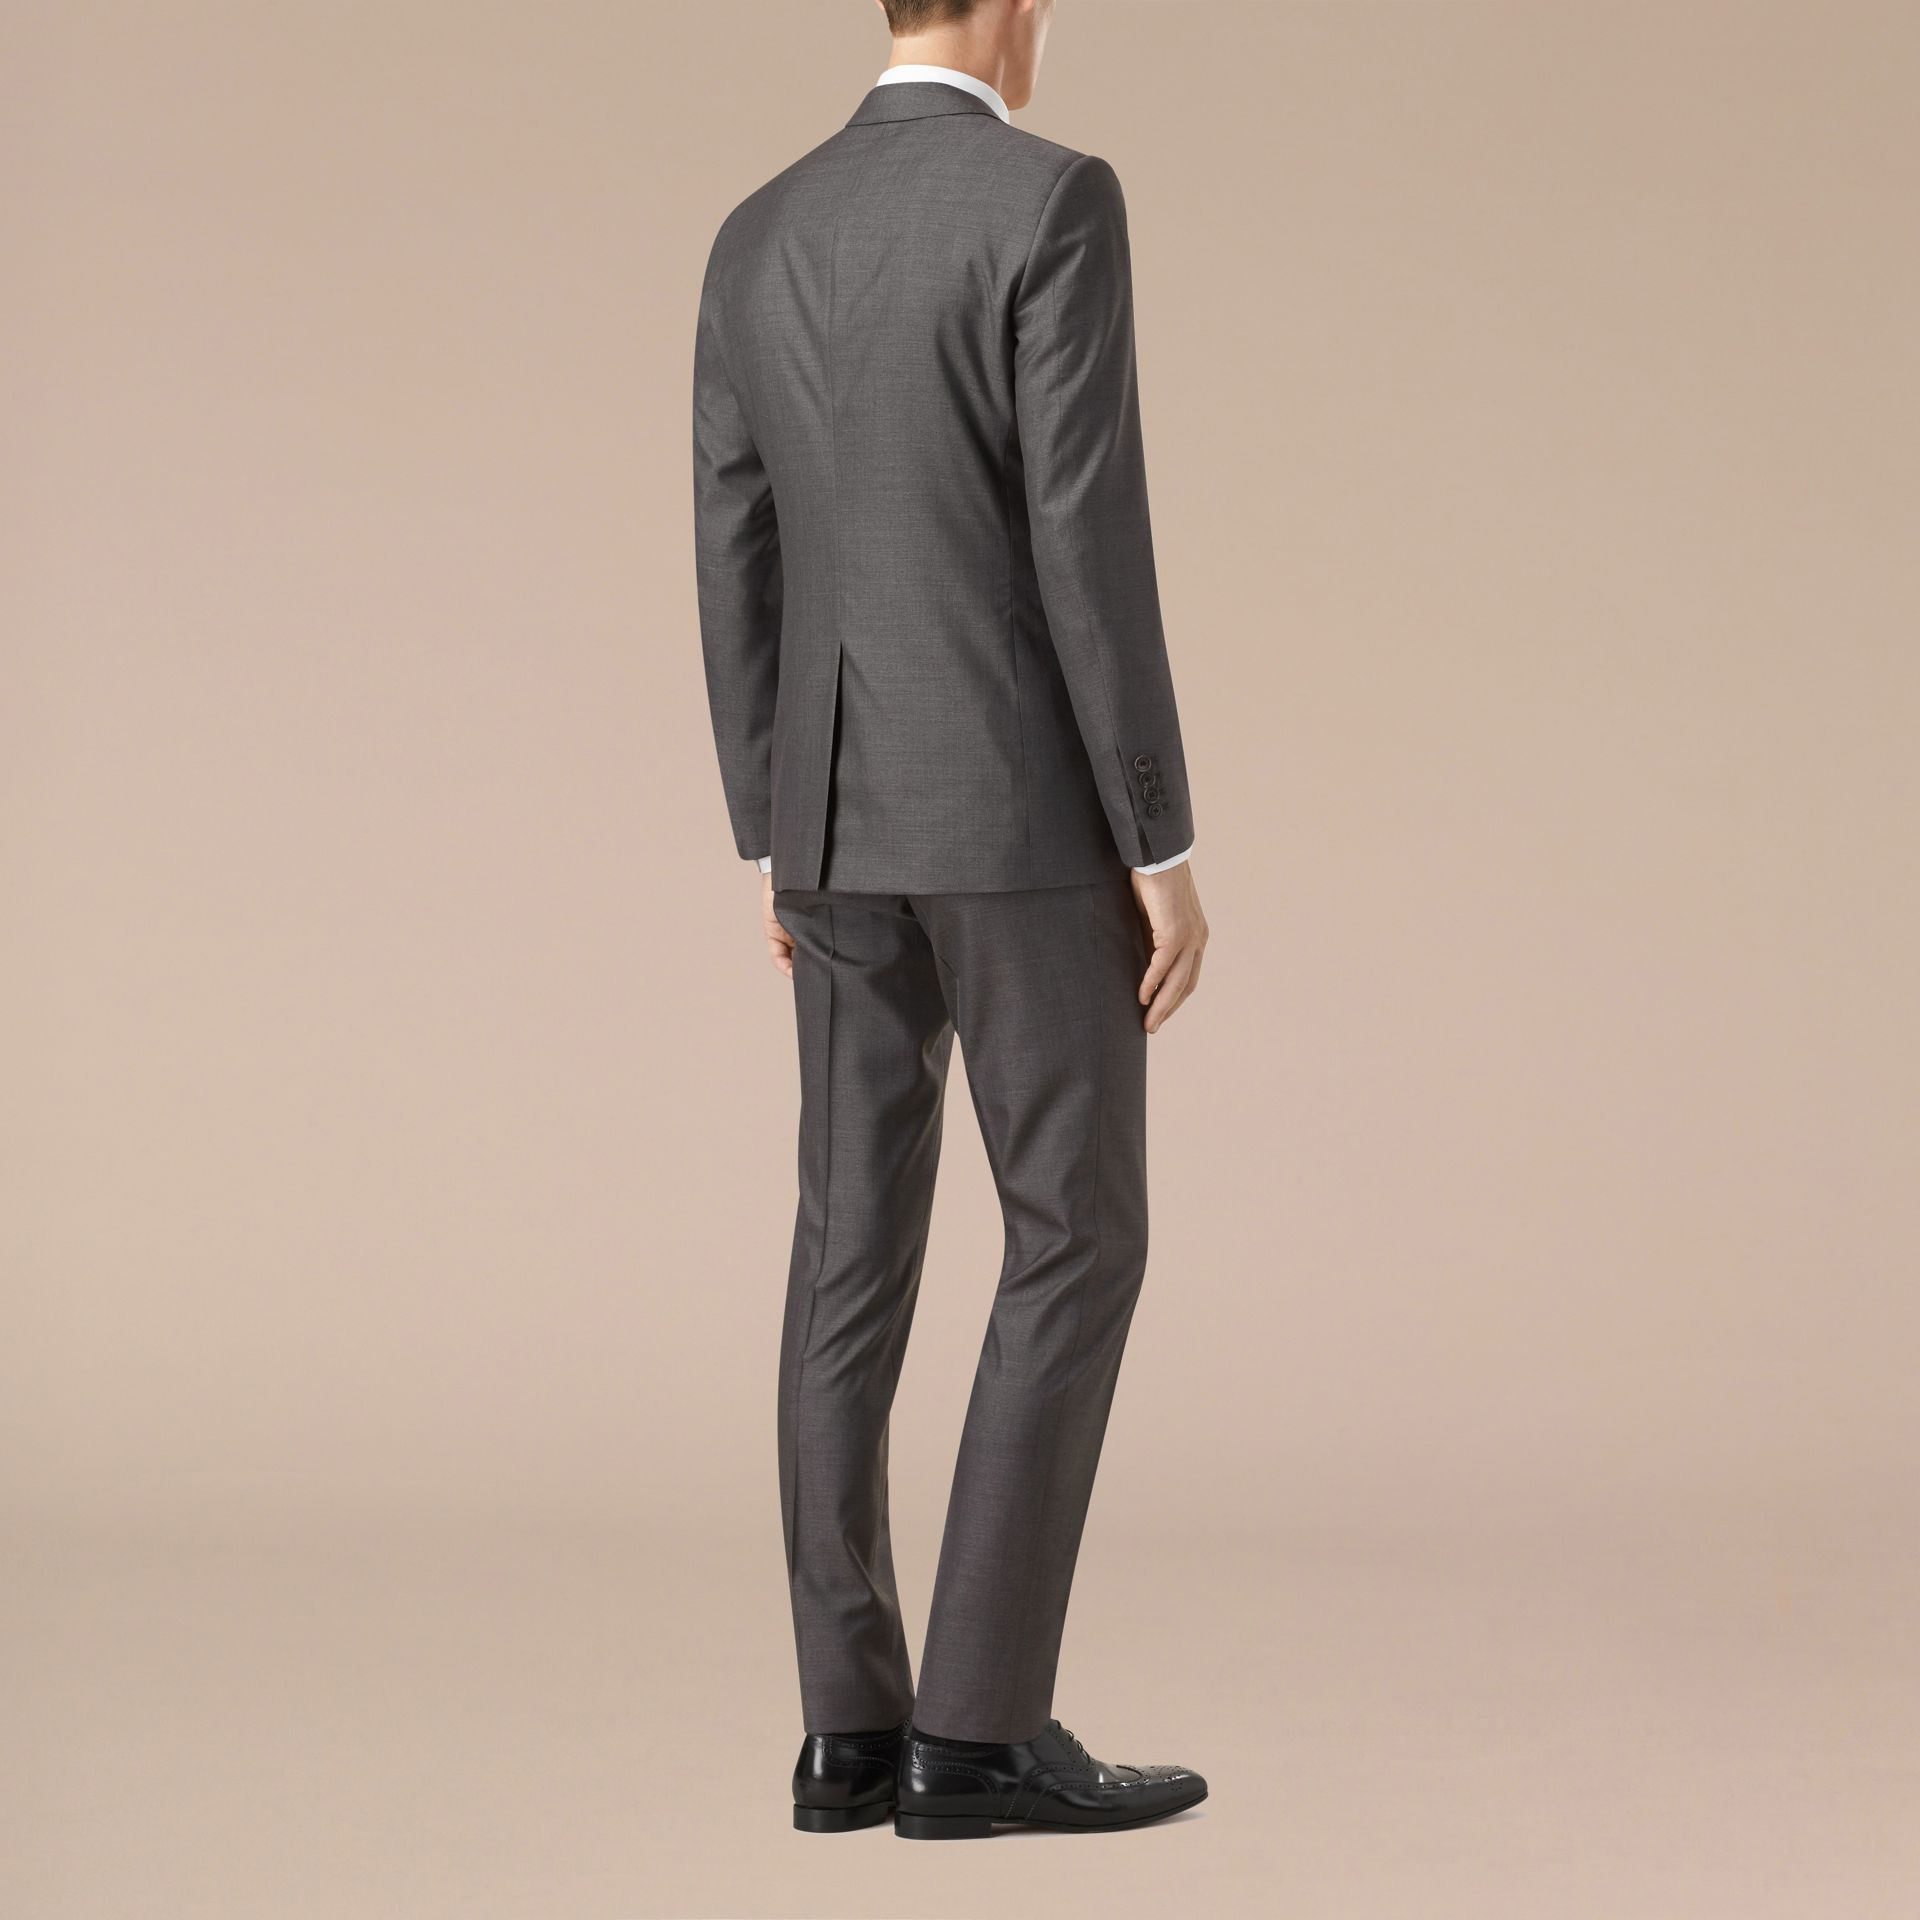 Темно-серый меланж Узкий костюм из шерсти и шелка - изображение 3